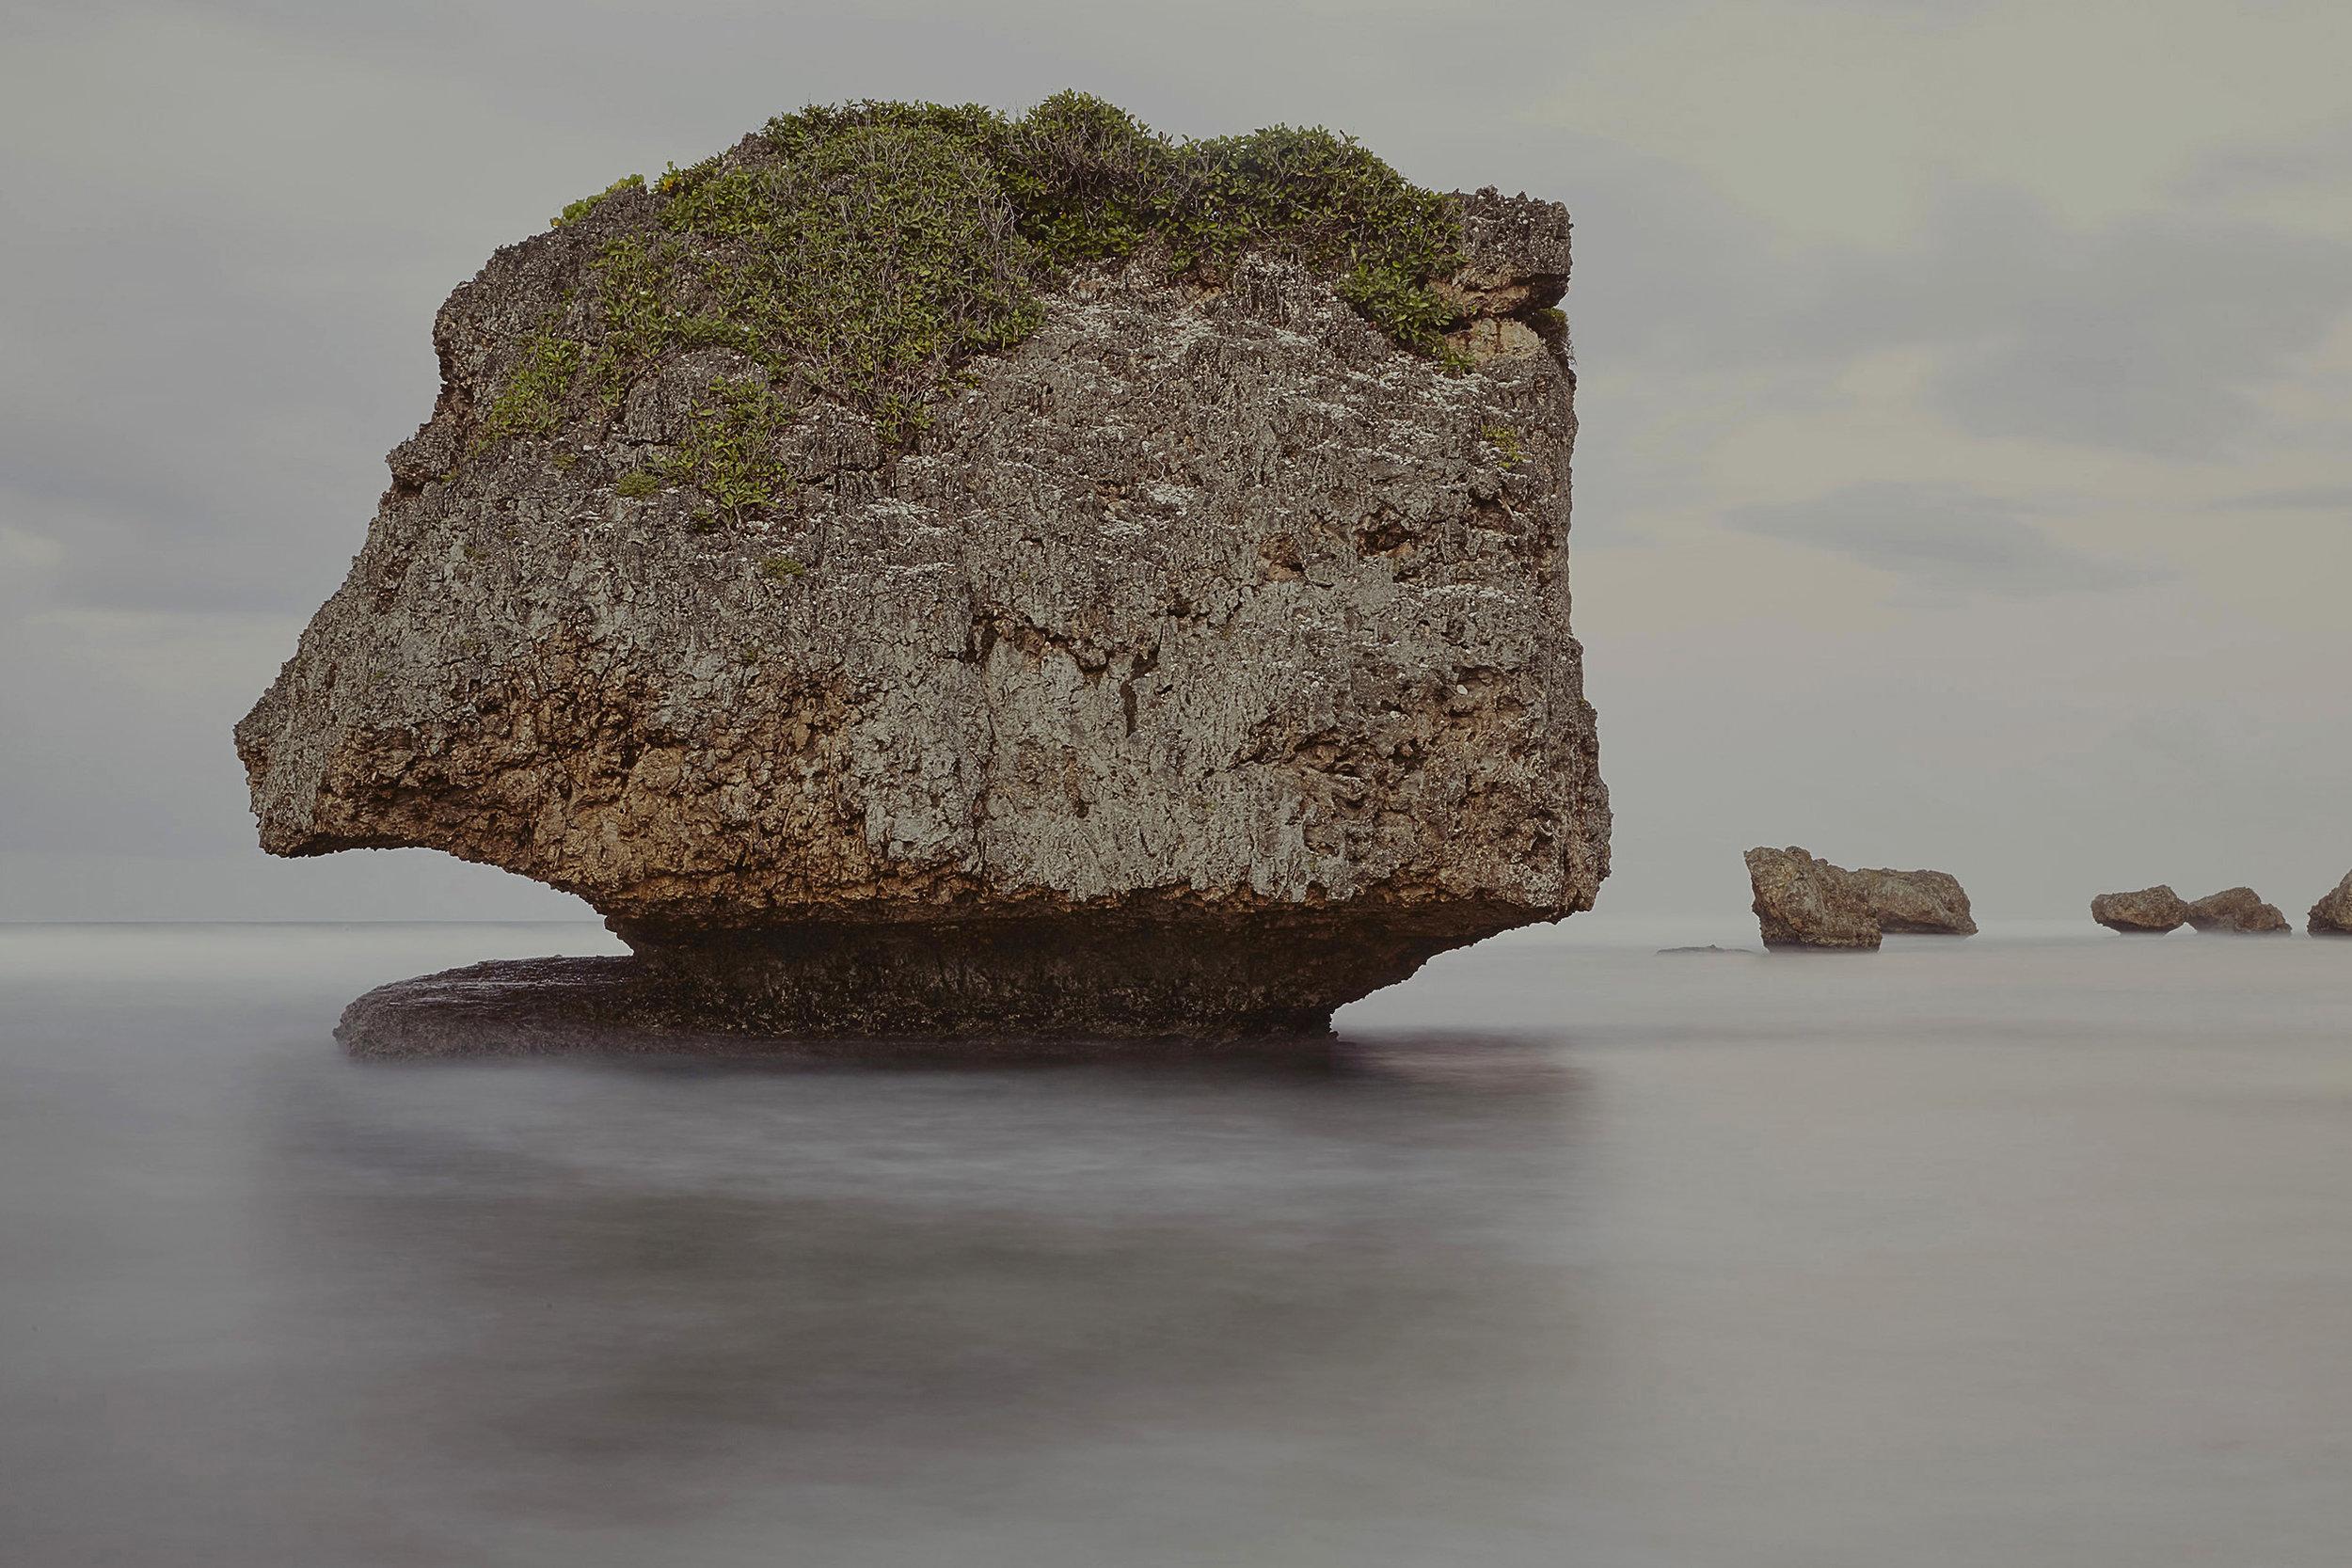 Patrick_Schuttler_Landscape_013.jpg